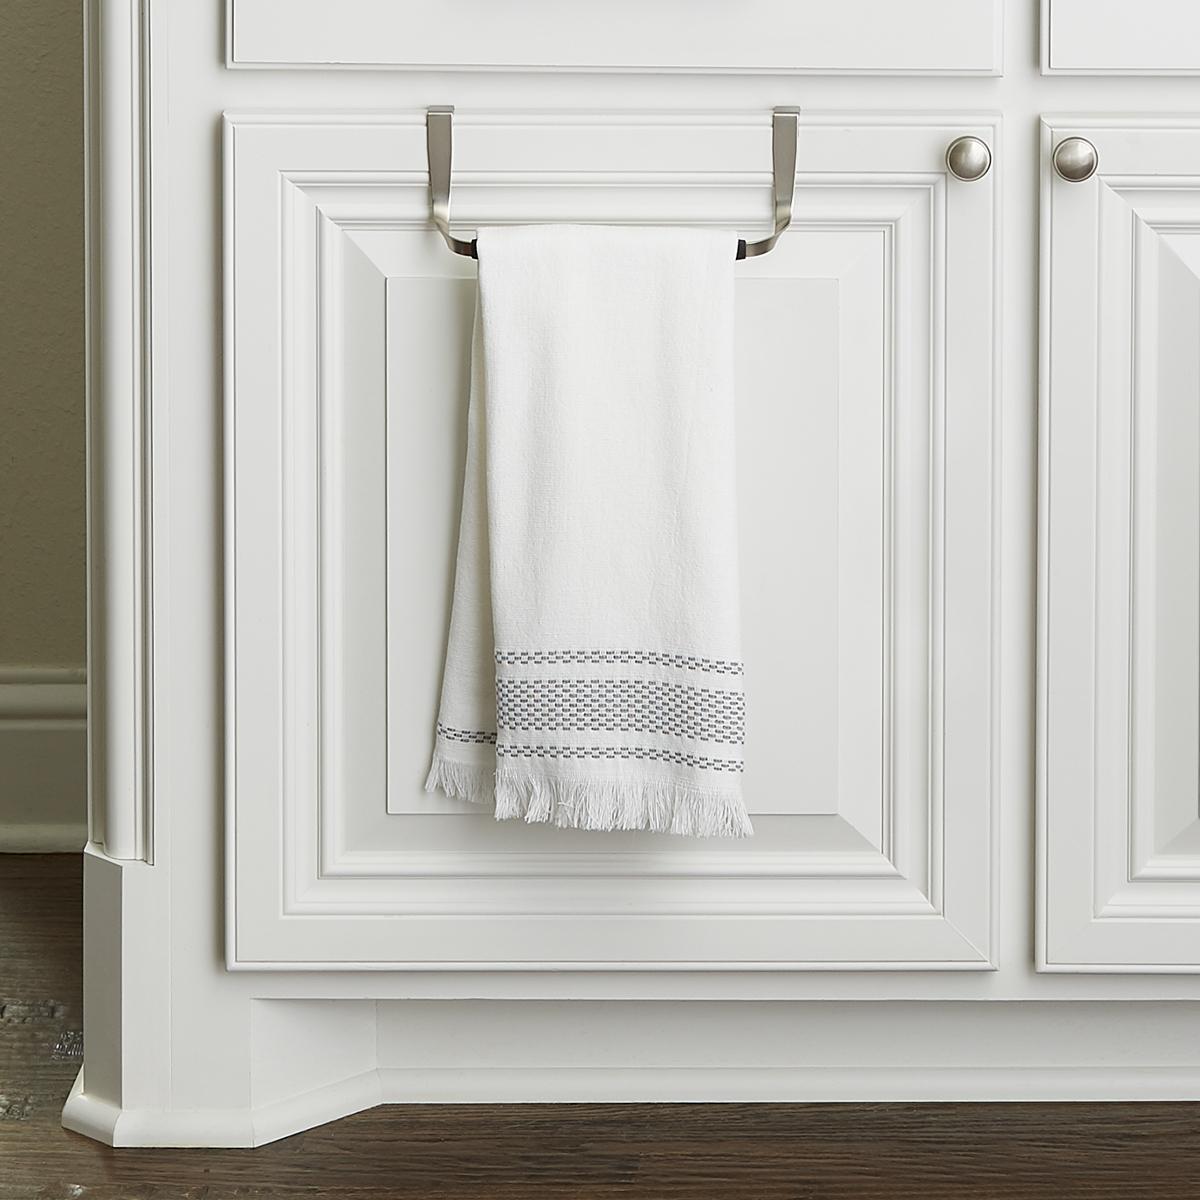 Schnook Overcabinet Towel Bar by Umbra